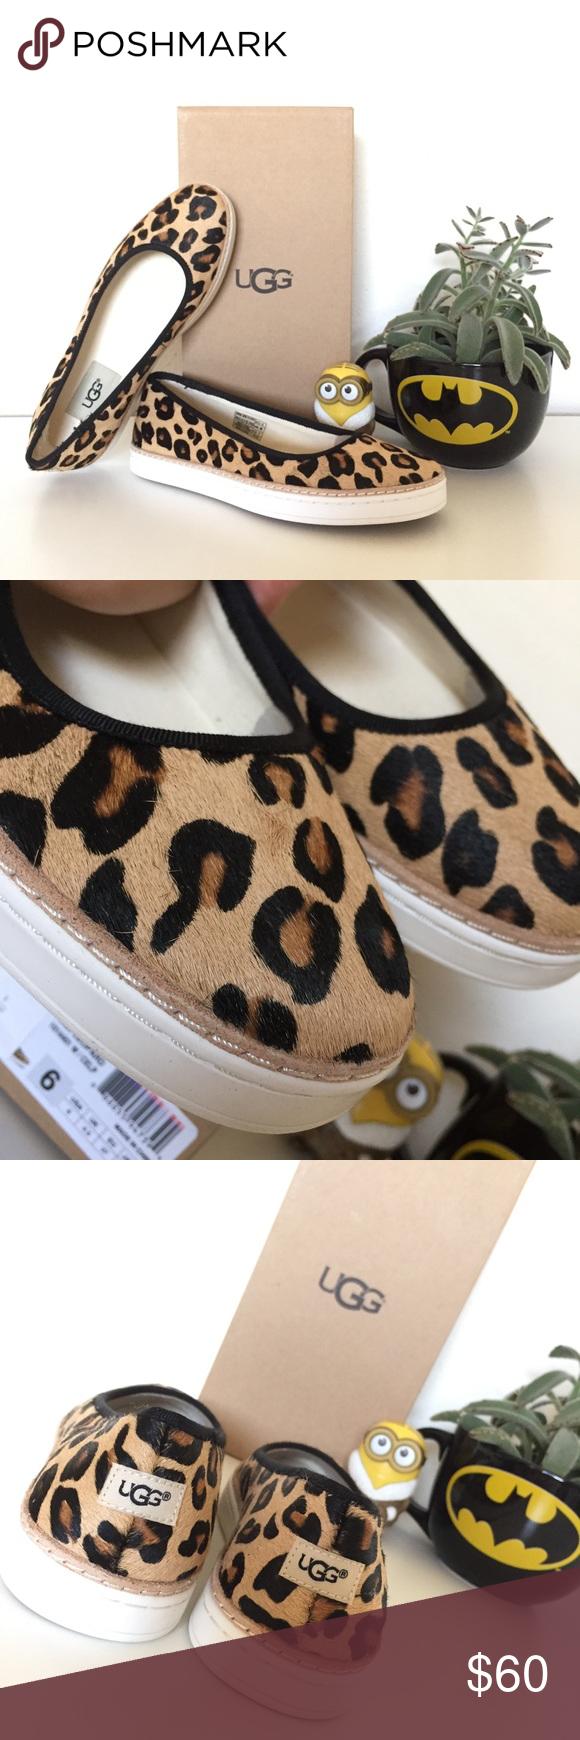 f3789eec7b04 NIB Ugg Kammi Calf Hair Leopard Fur Suede Flat 6 Brand new in box. Women